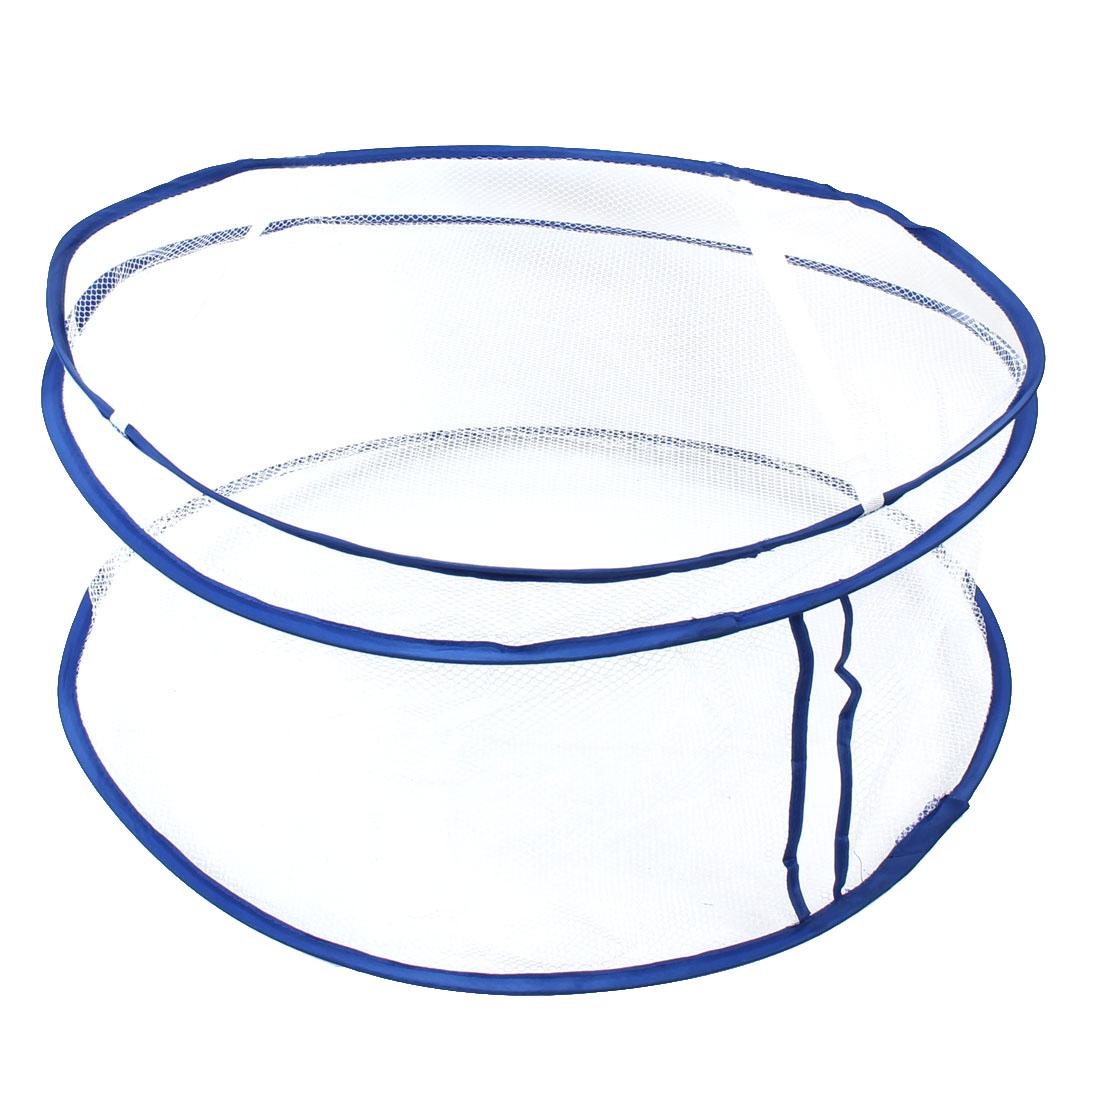 Home Nylon Mesh Foldable Detachable Washing Clothes Laundry Basket Bag Bin Storage